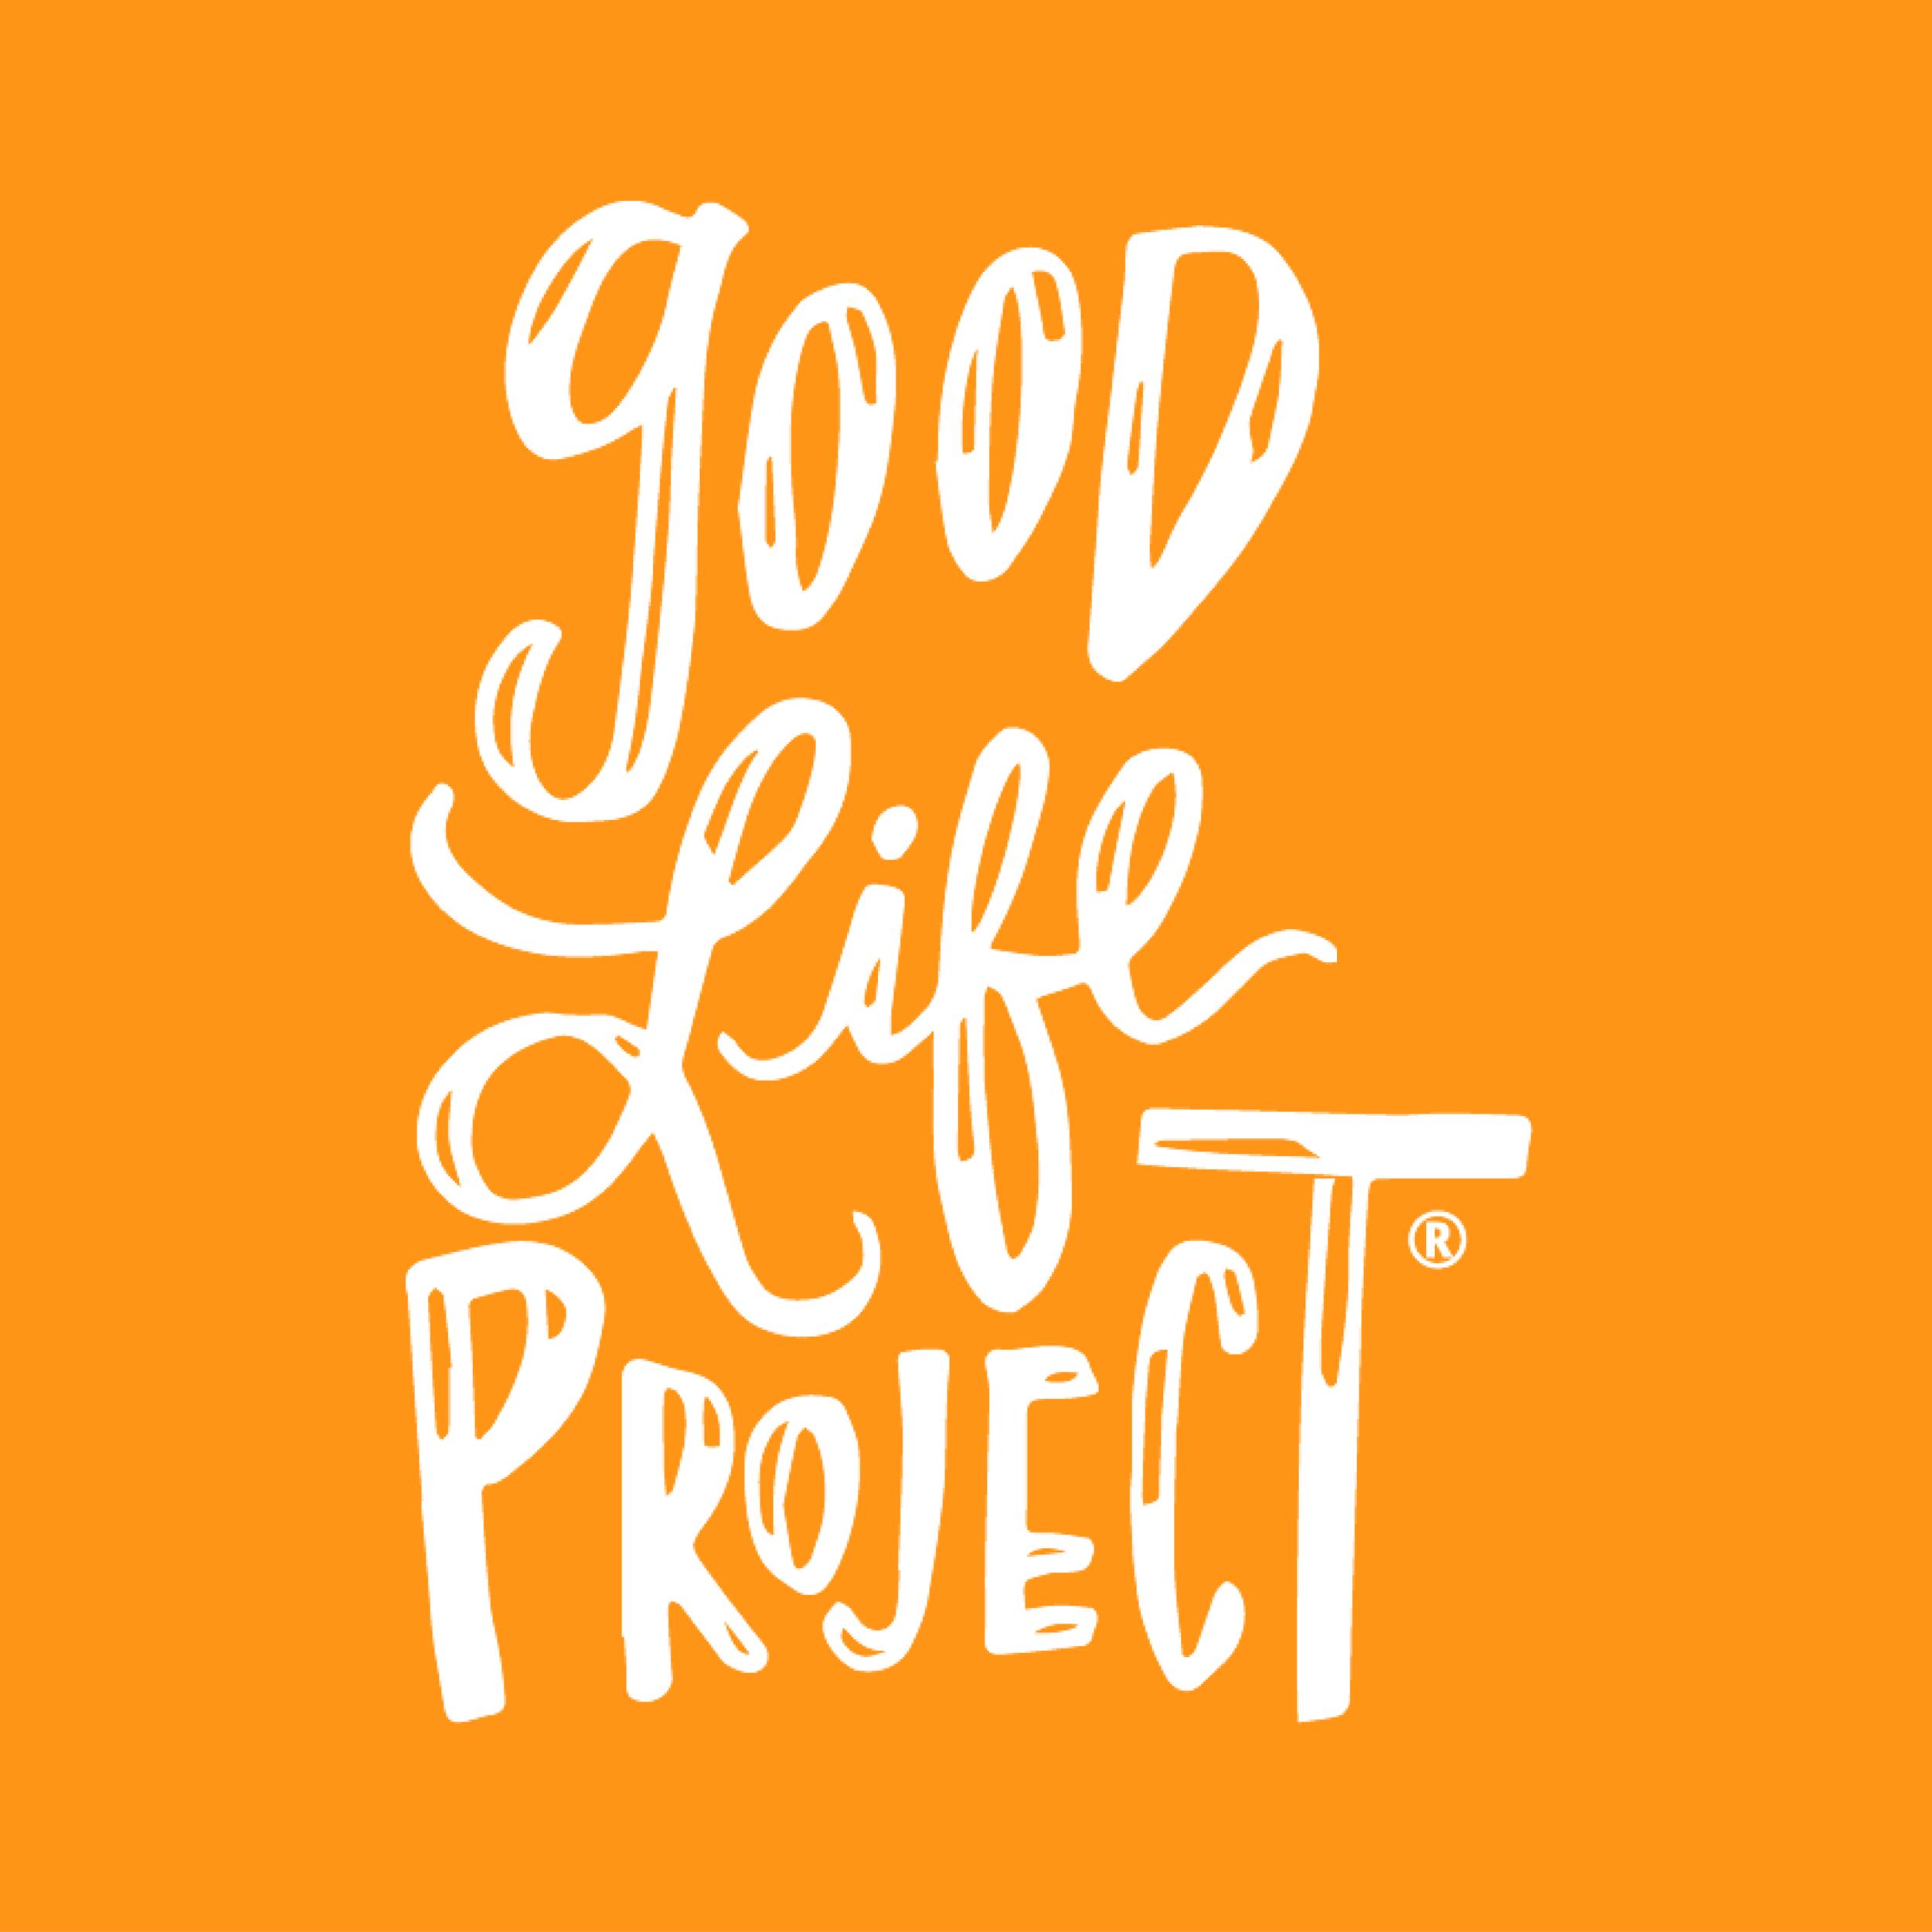 good_life_project_itunes.png